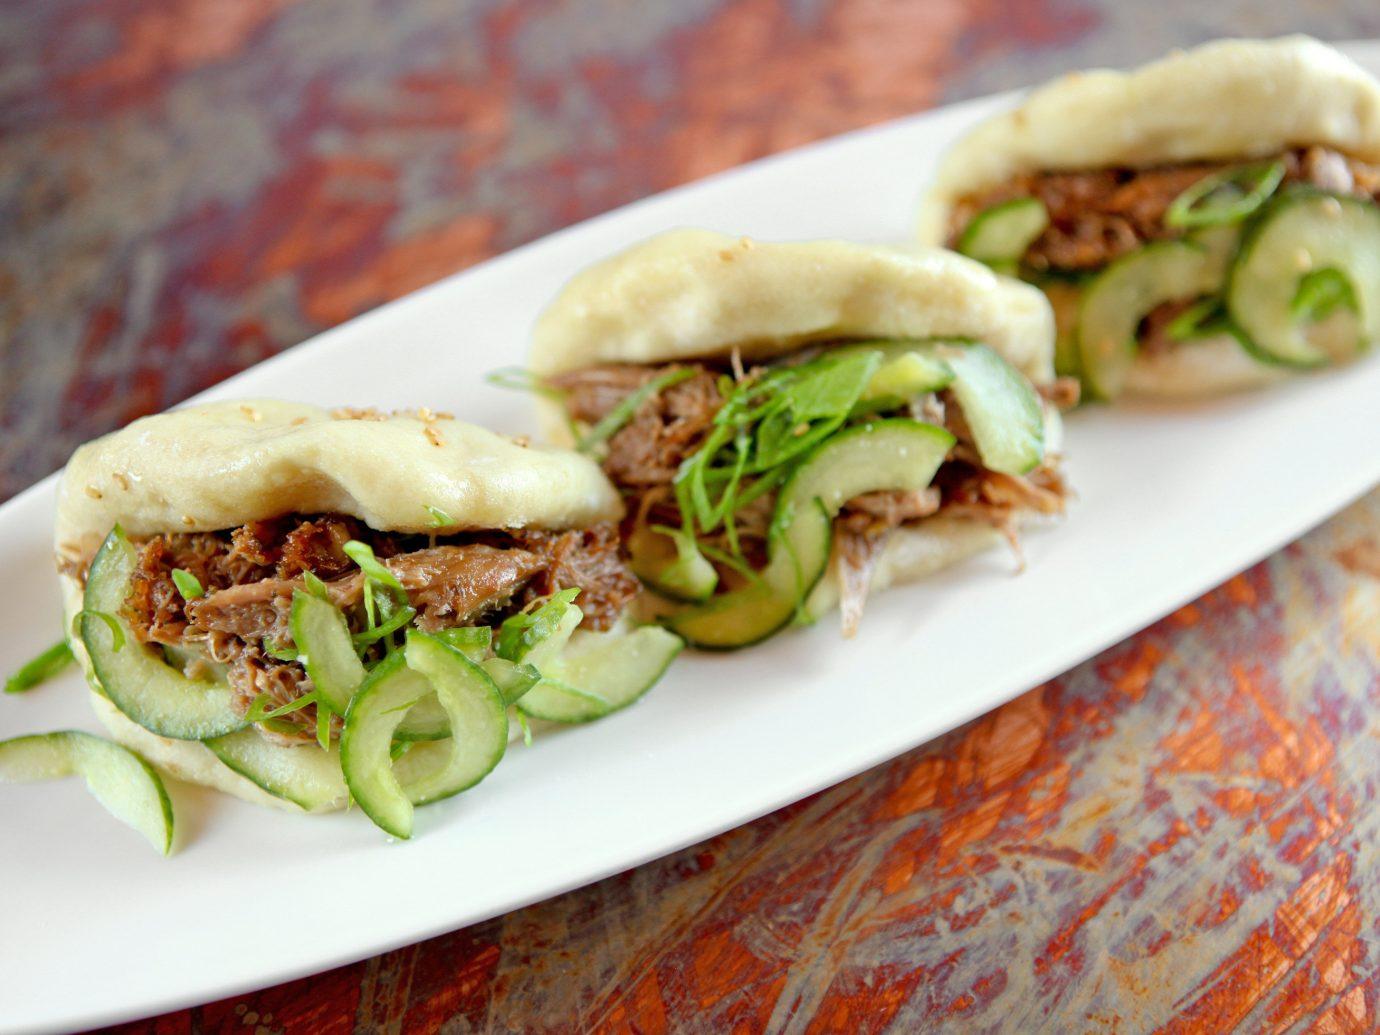 Food + Drink food plate dish indoor produce cuisine sandwich wrap vegetable flatbread sandwich meat mediterranean food snack food